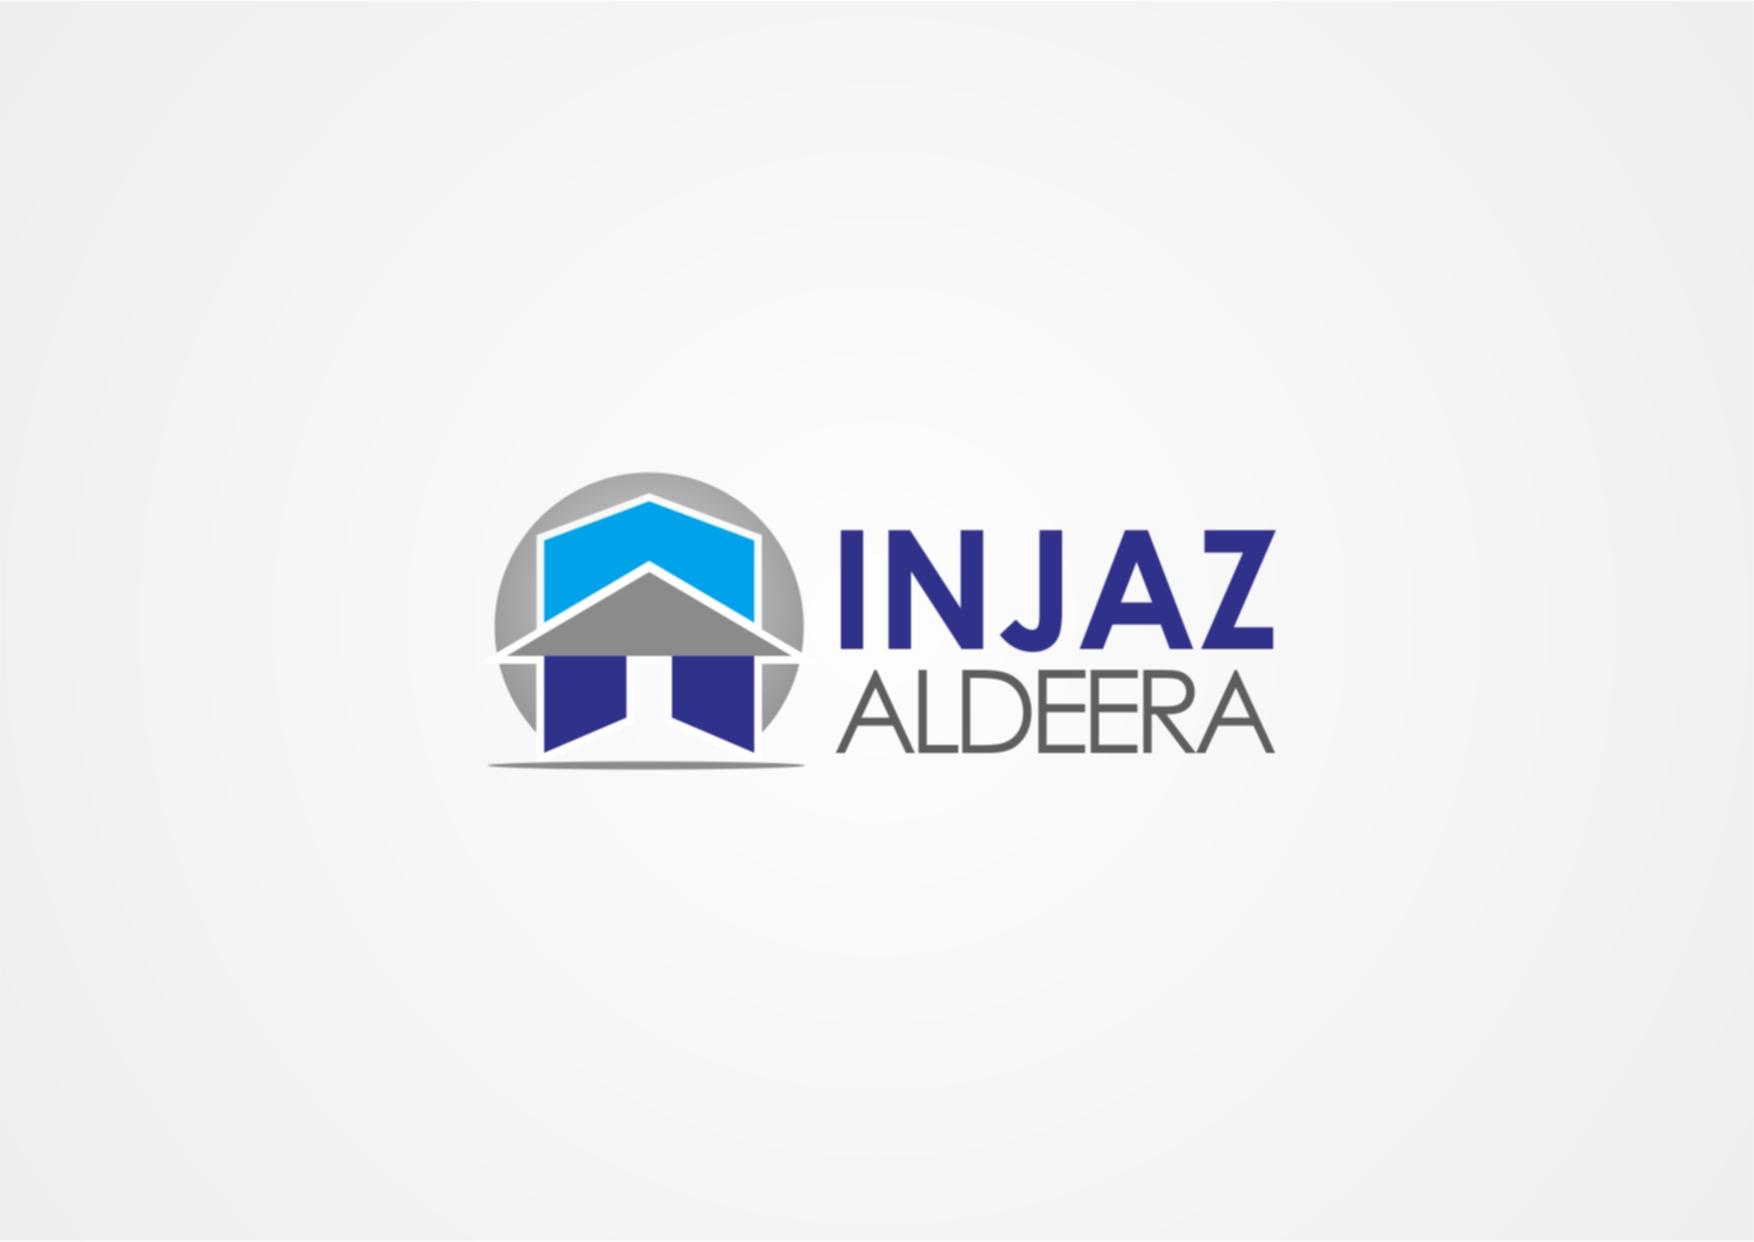 Logo Design by Private User - Entry No. 39 in the Logo Design Contest Fun Logo Design for Injaz aldeera.